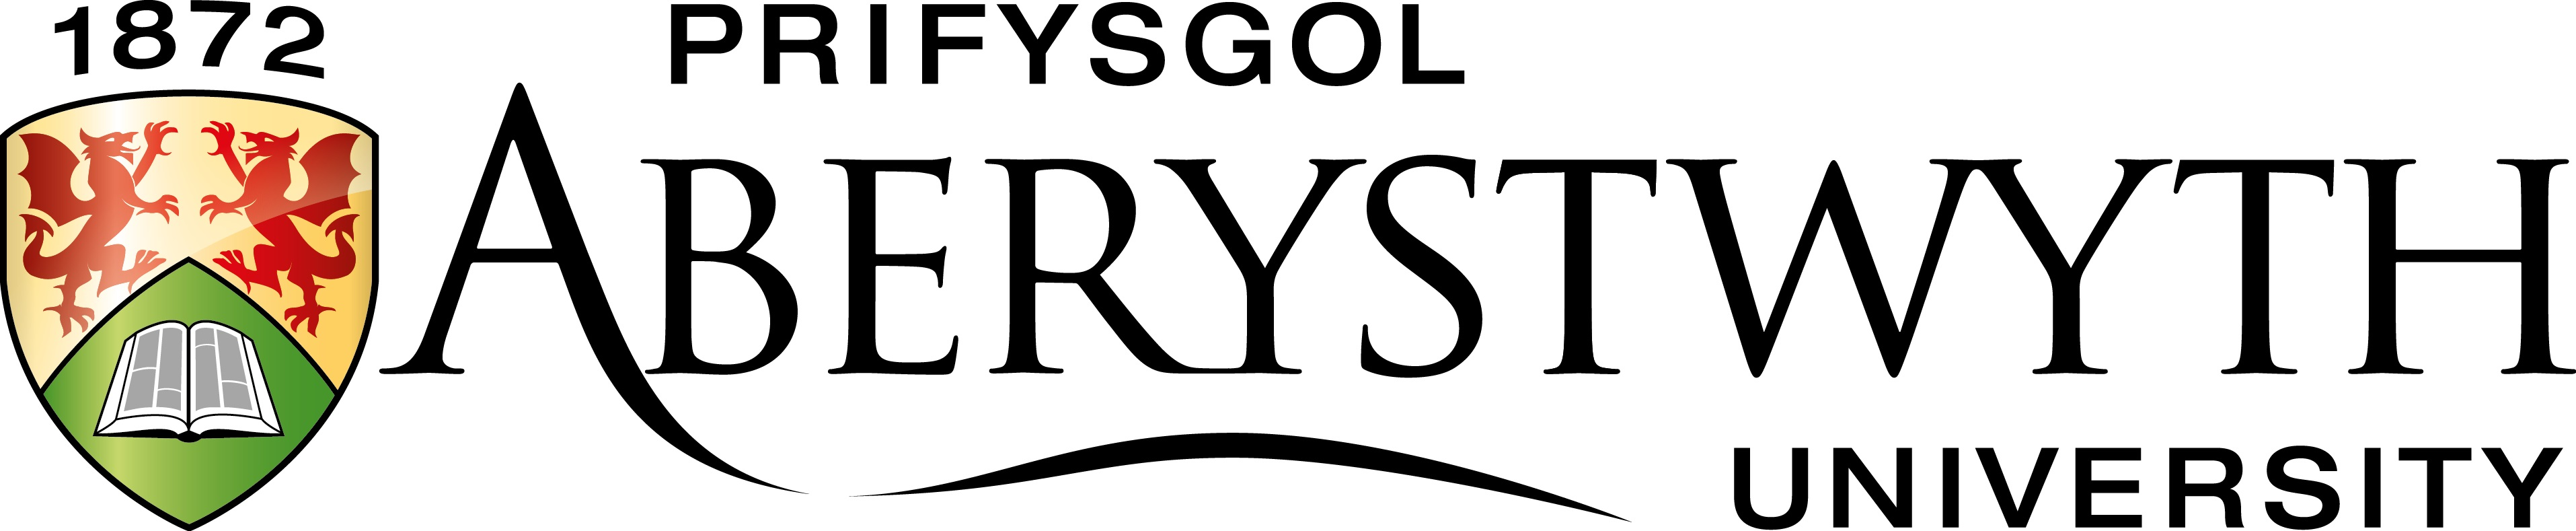 Student Accommodation in Aberystwyth near Aberystwyth University - Penglais Campus